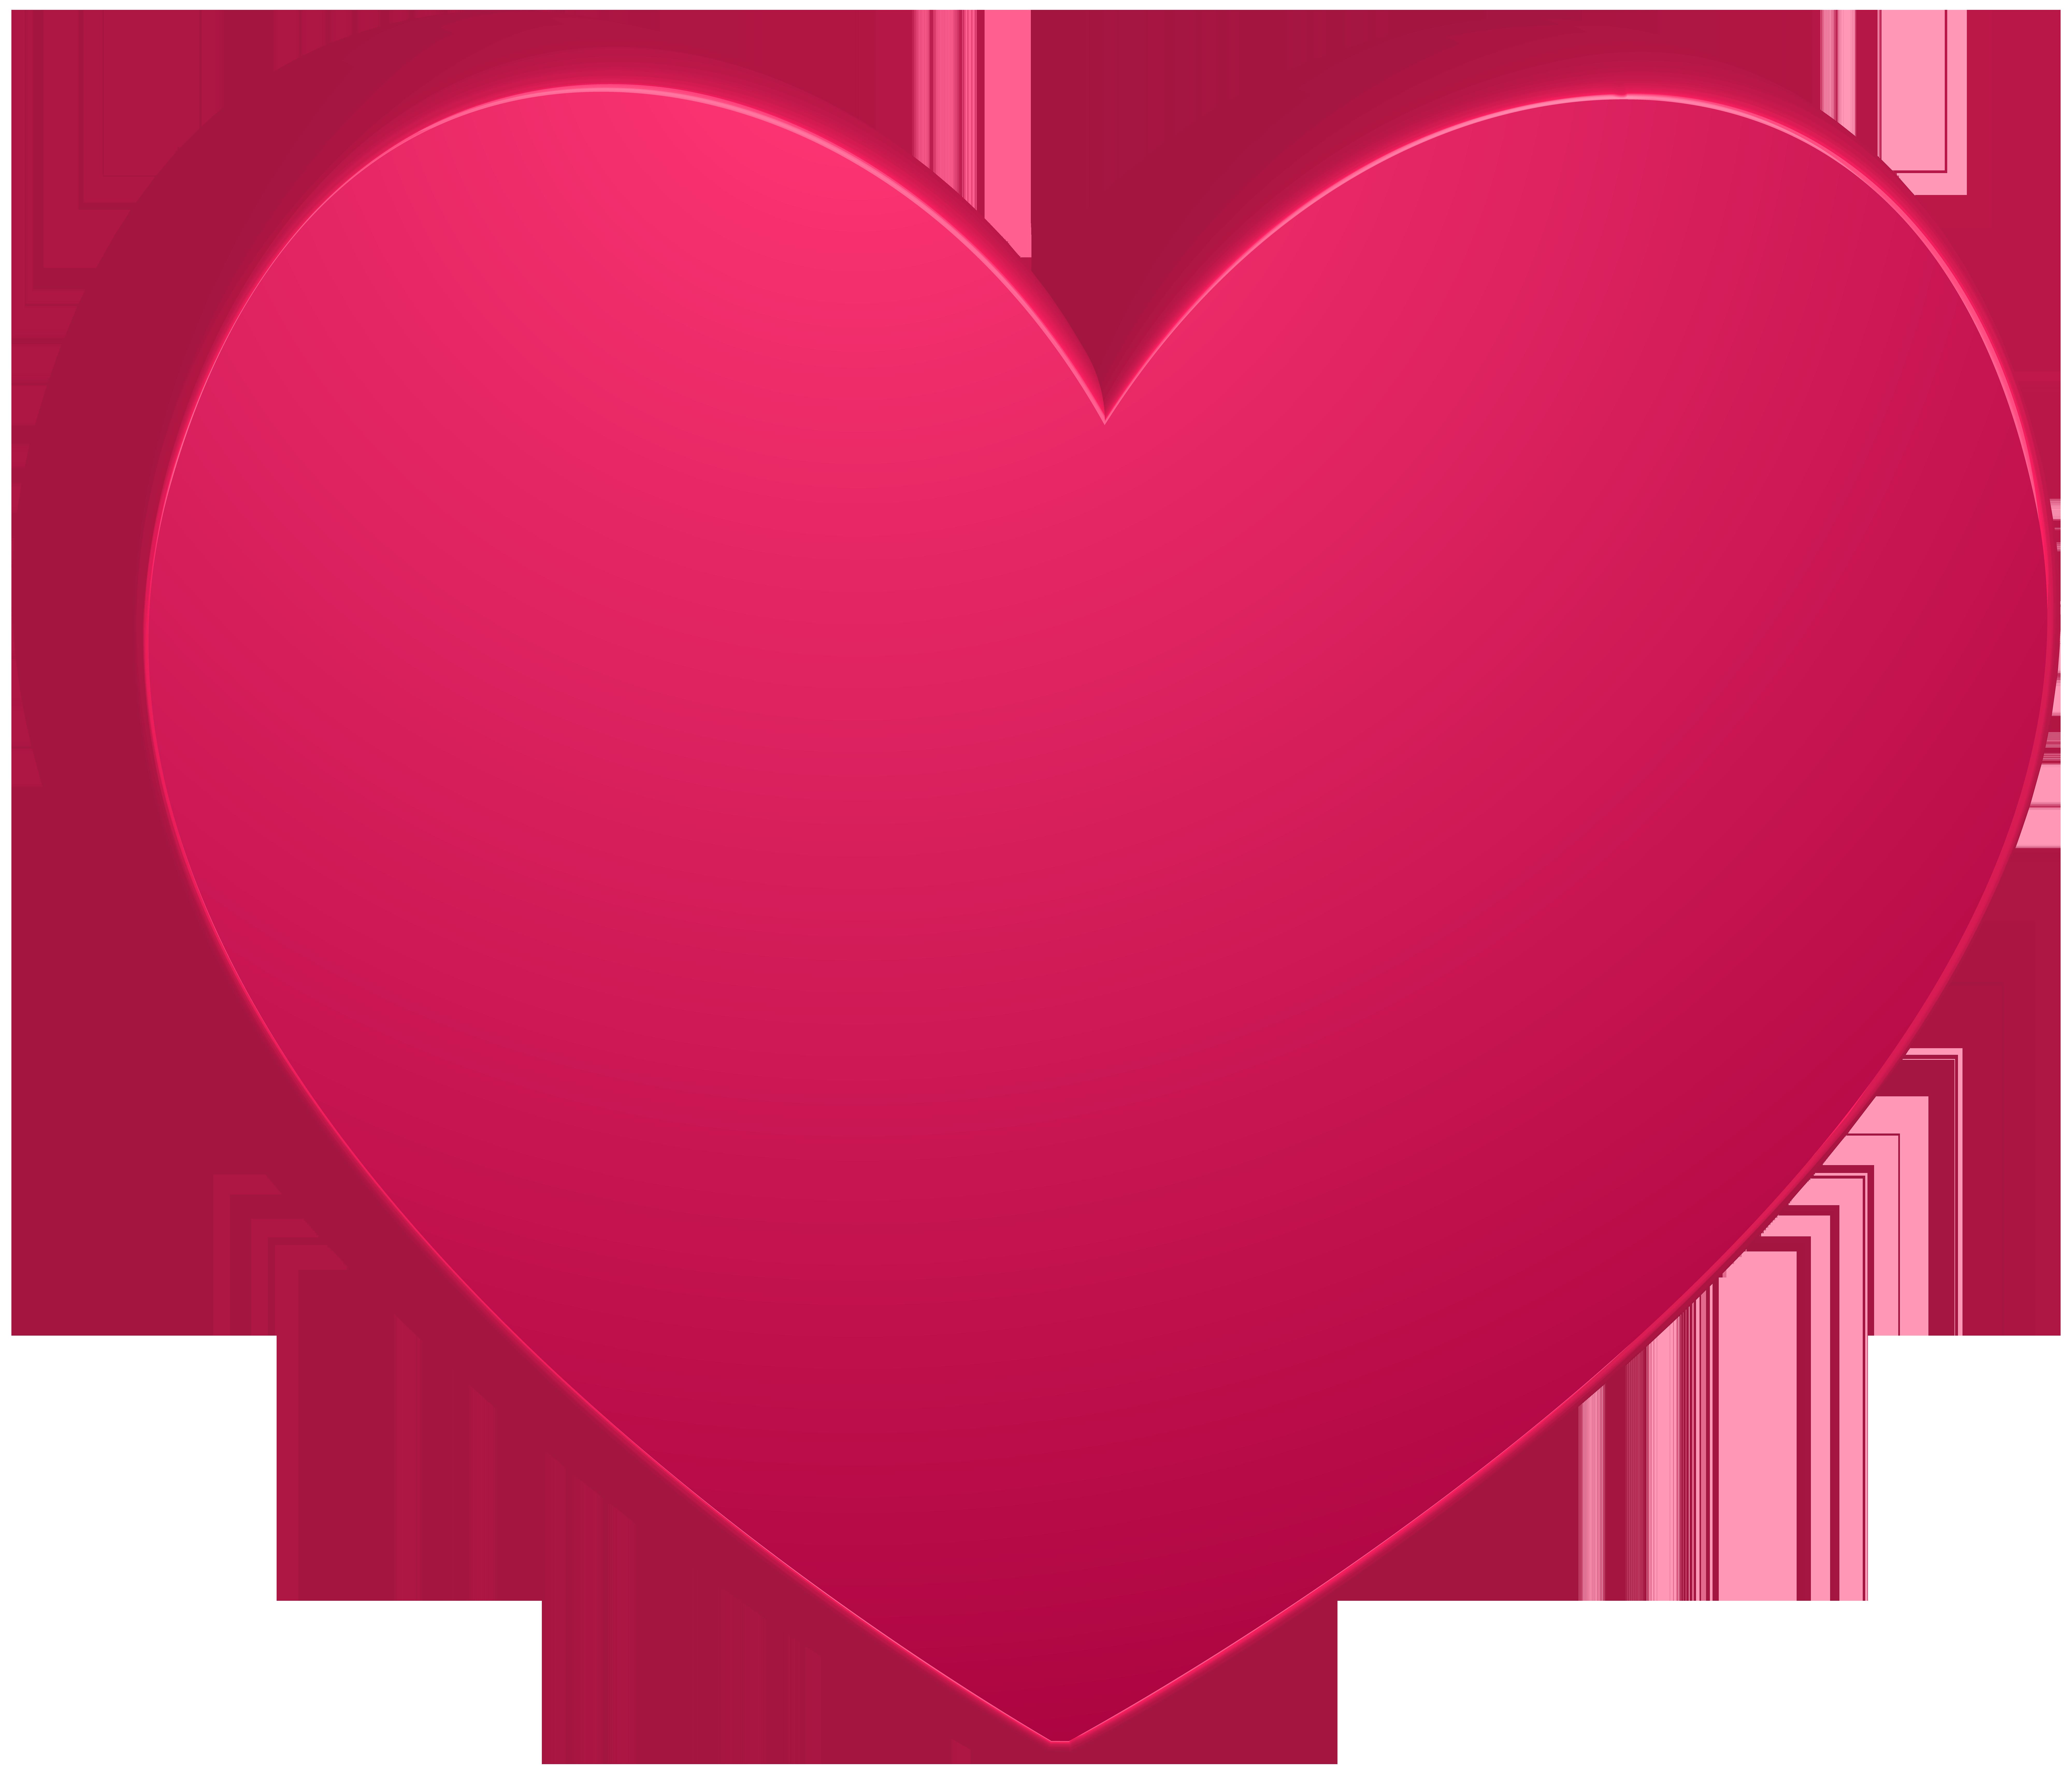 Pink transparent png clip. Clipart rock heart